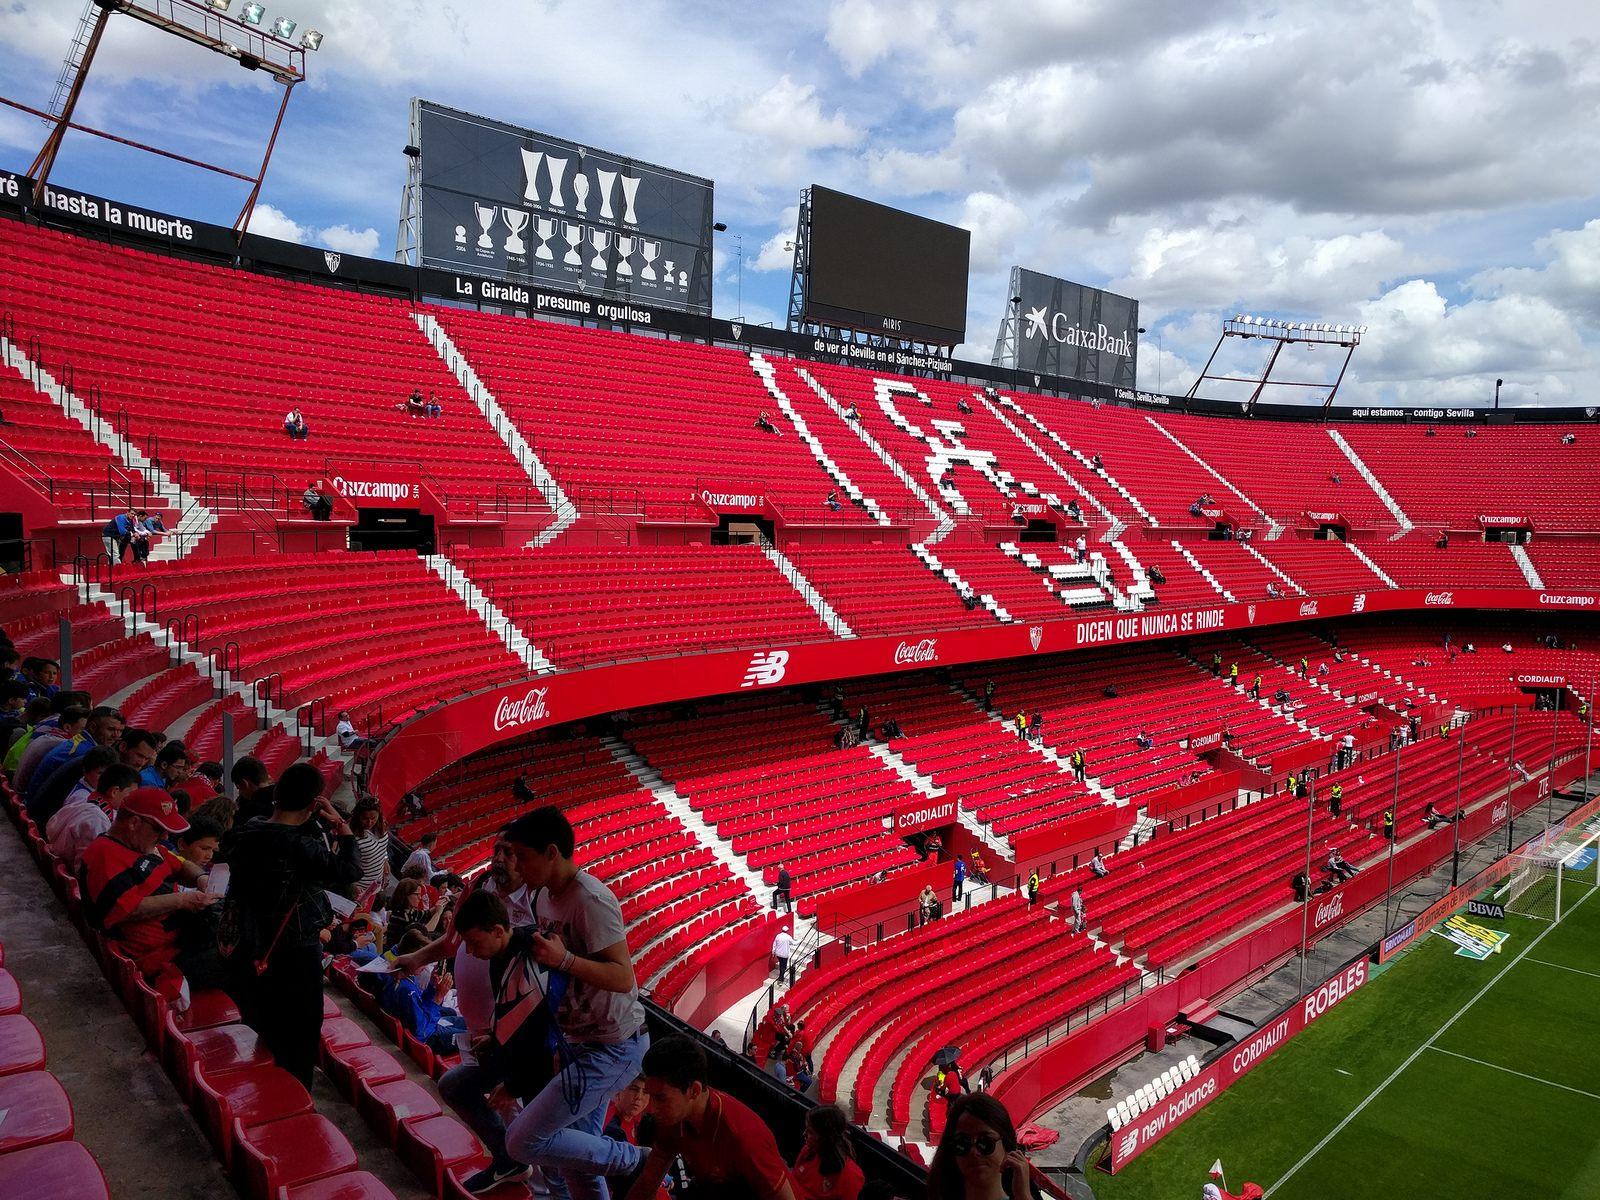 Estadio Ramon Sanchez Pizjuan La Bombonera De Nervion Stadiumdb Com